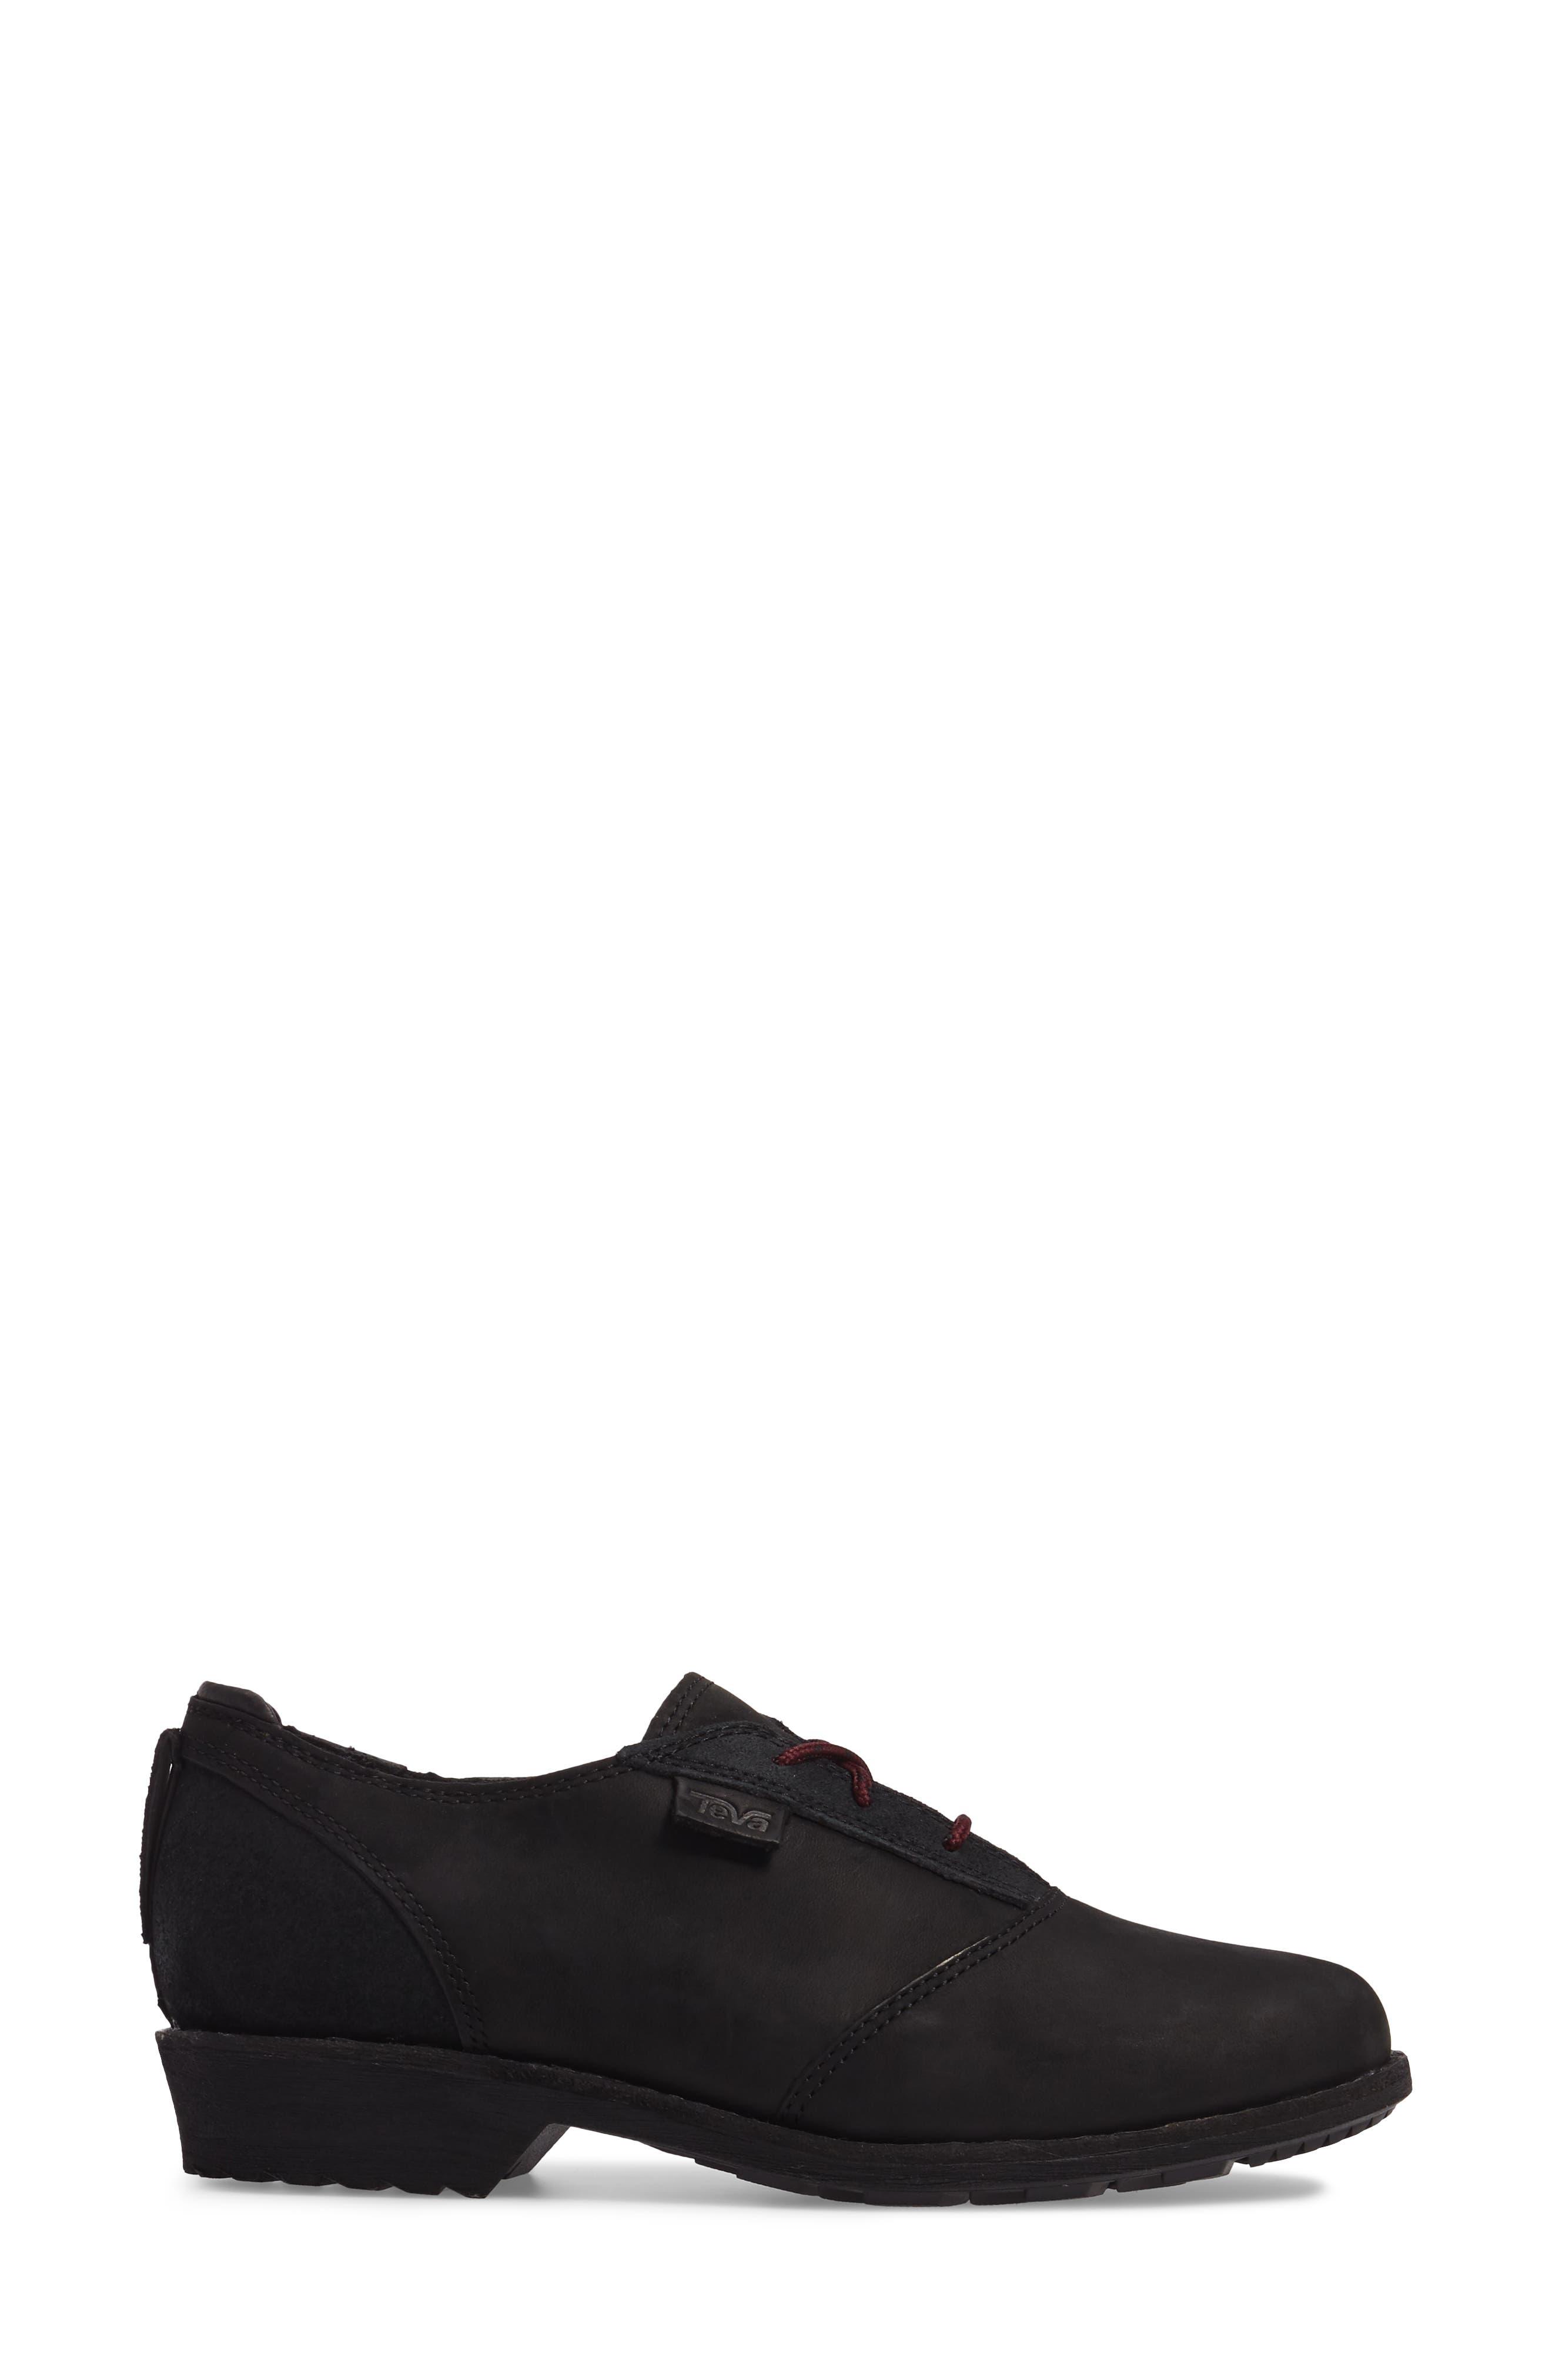 Alternate Image 3  - Teva De La Vina Dos Waterproof Sneaker (Women)